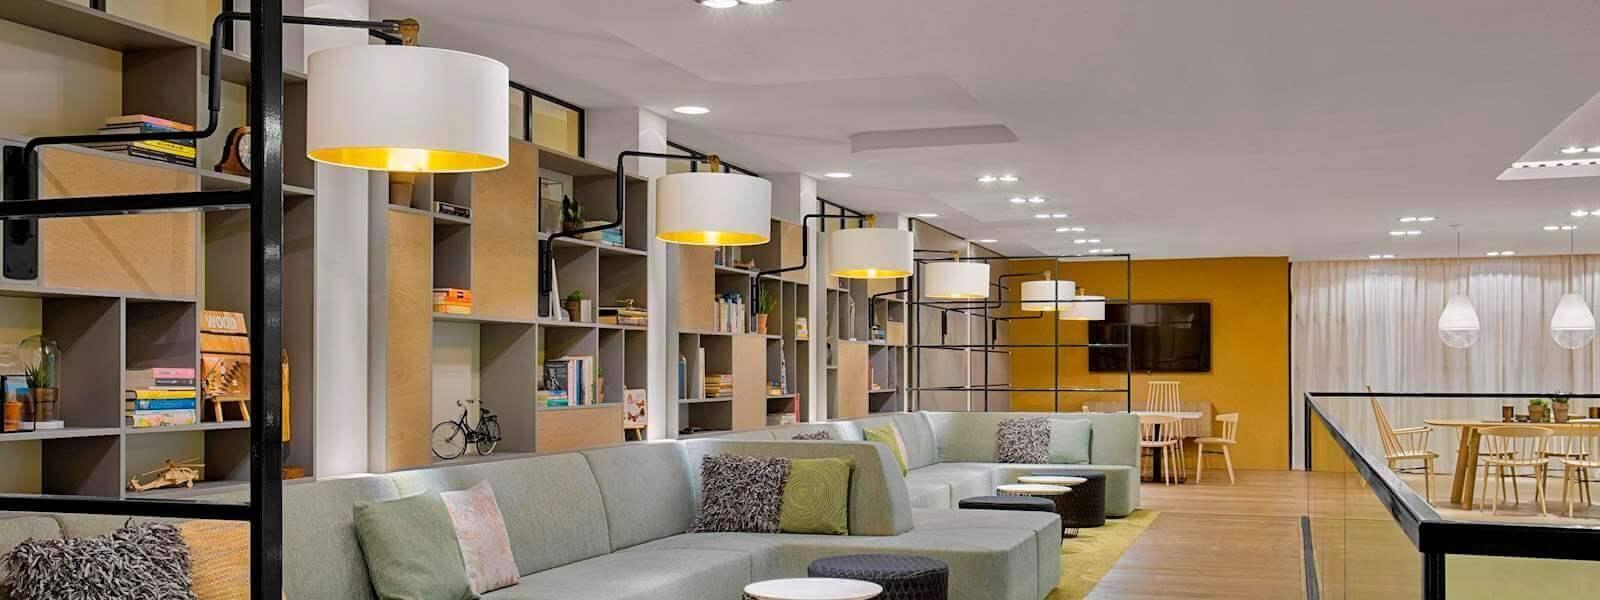 Element Amsterdam Hotel | Lang en kort verblijf | Official Website